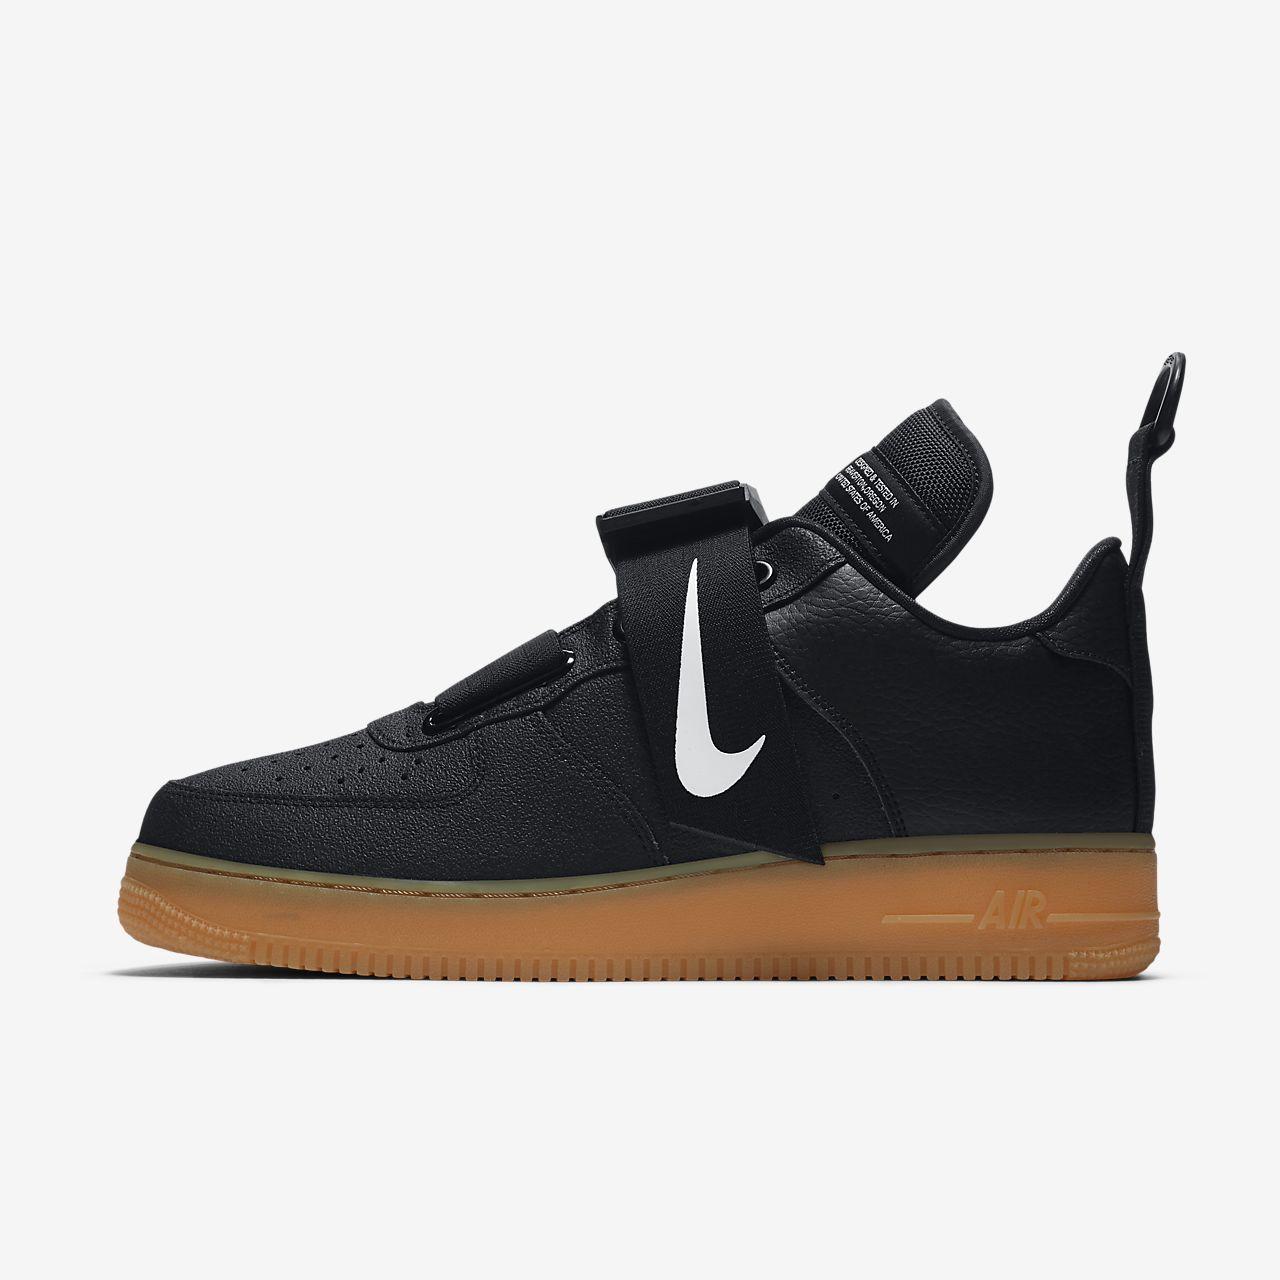 2a4db5e9bc3b71 Nike Air Force 1 Utility Men s Shoe. Nike.com DK